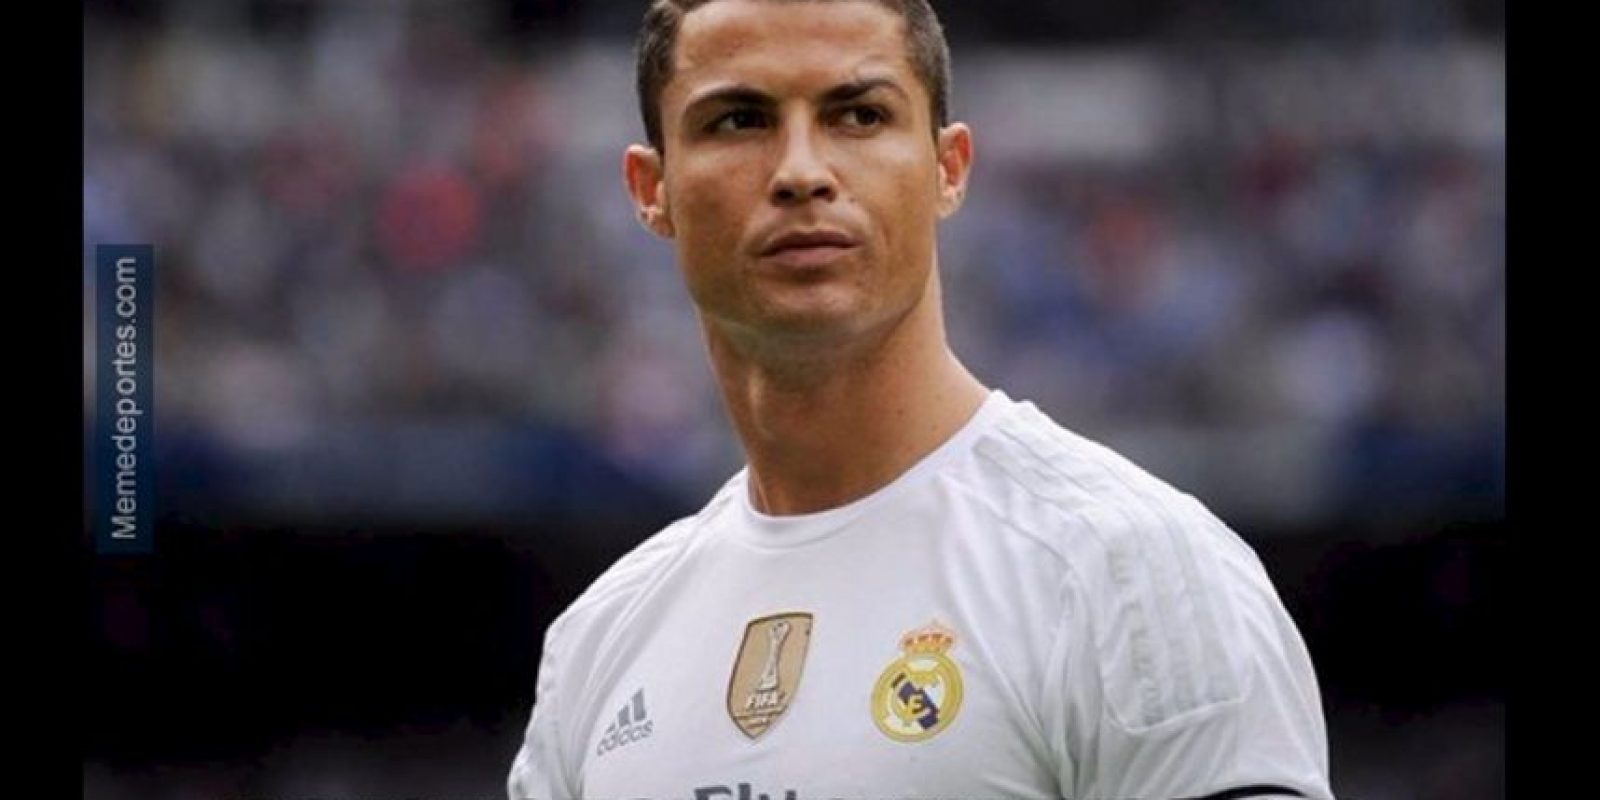 Cristiano Ronaldo llegaba con altas expectativas al Clásico. Foto:memedeportes.com